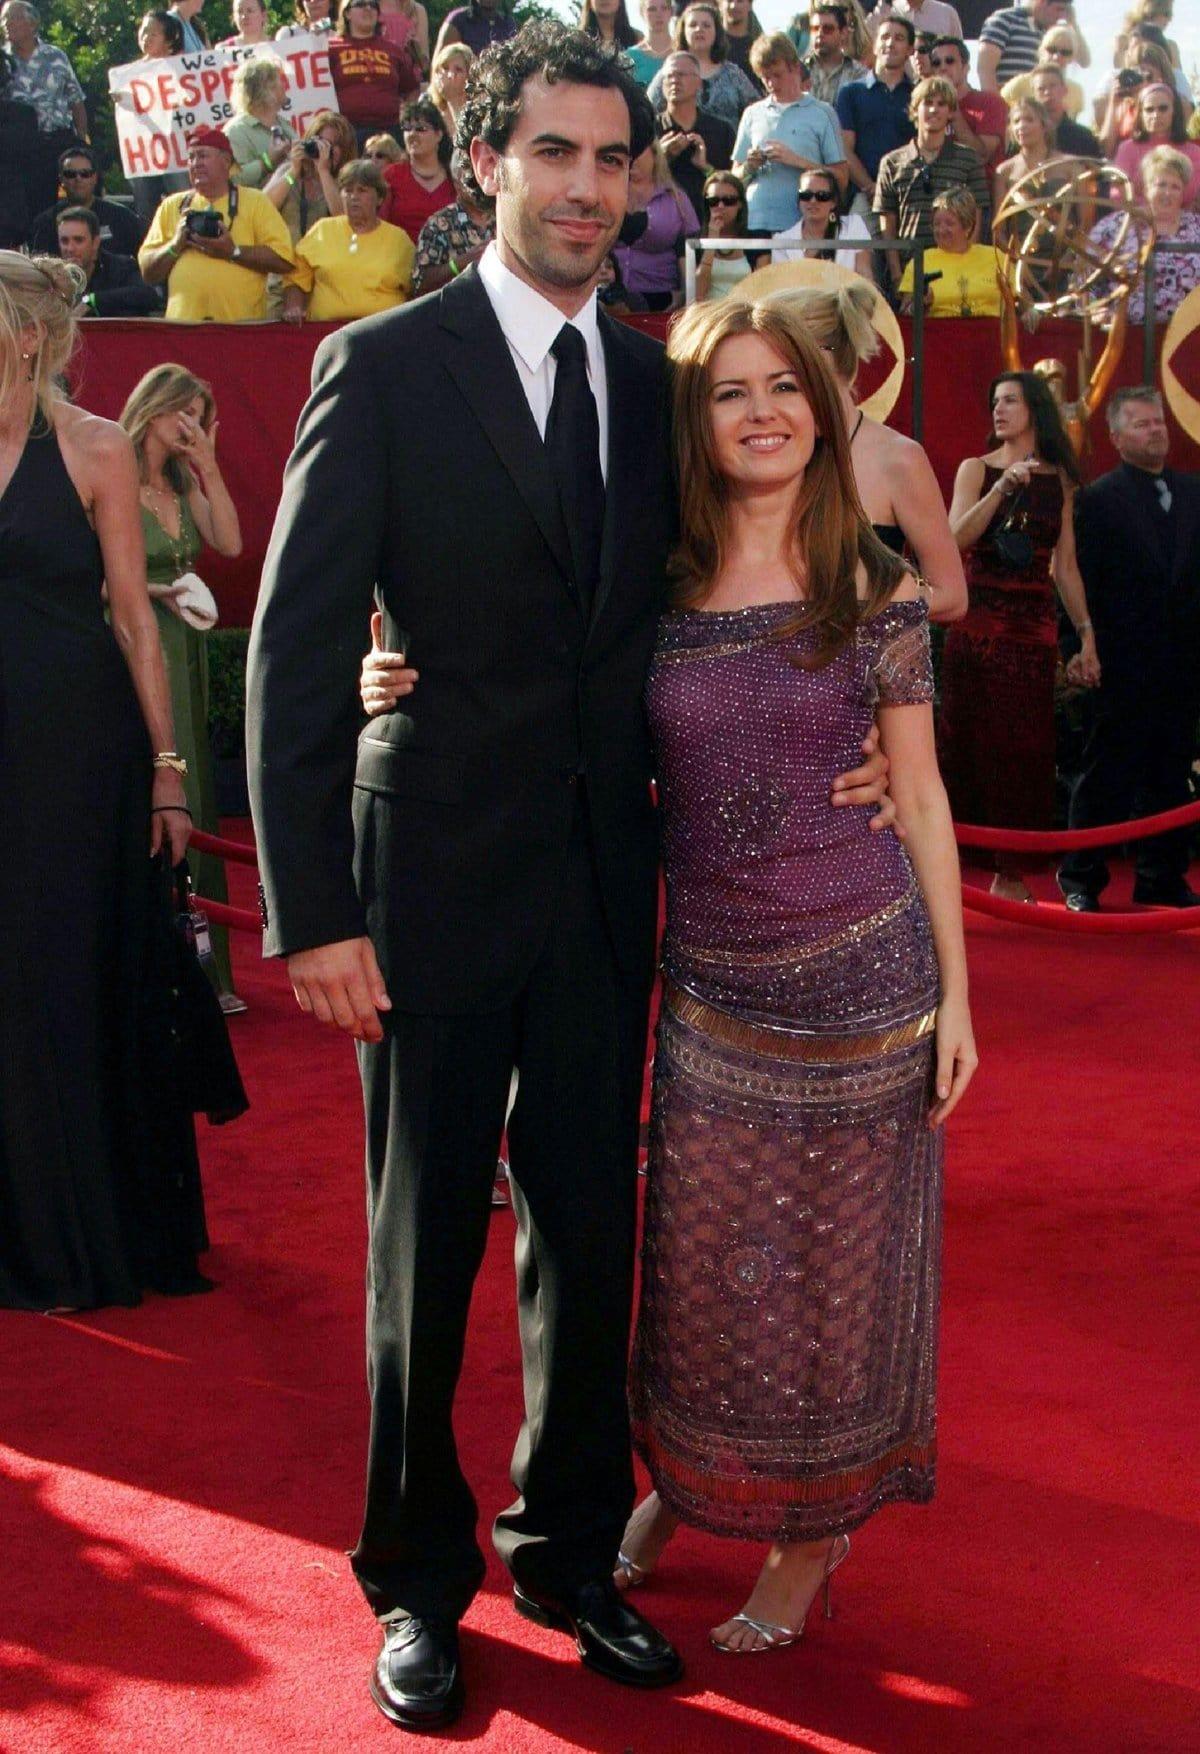 Actress Isla Fisher and her much taller boyfriend Sacha Baron Cohen